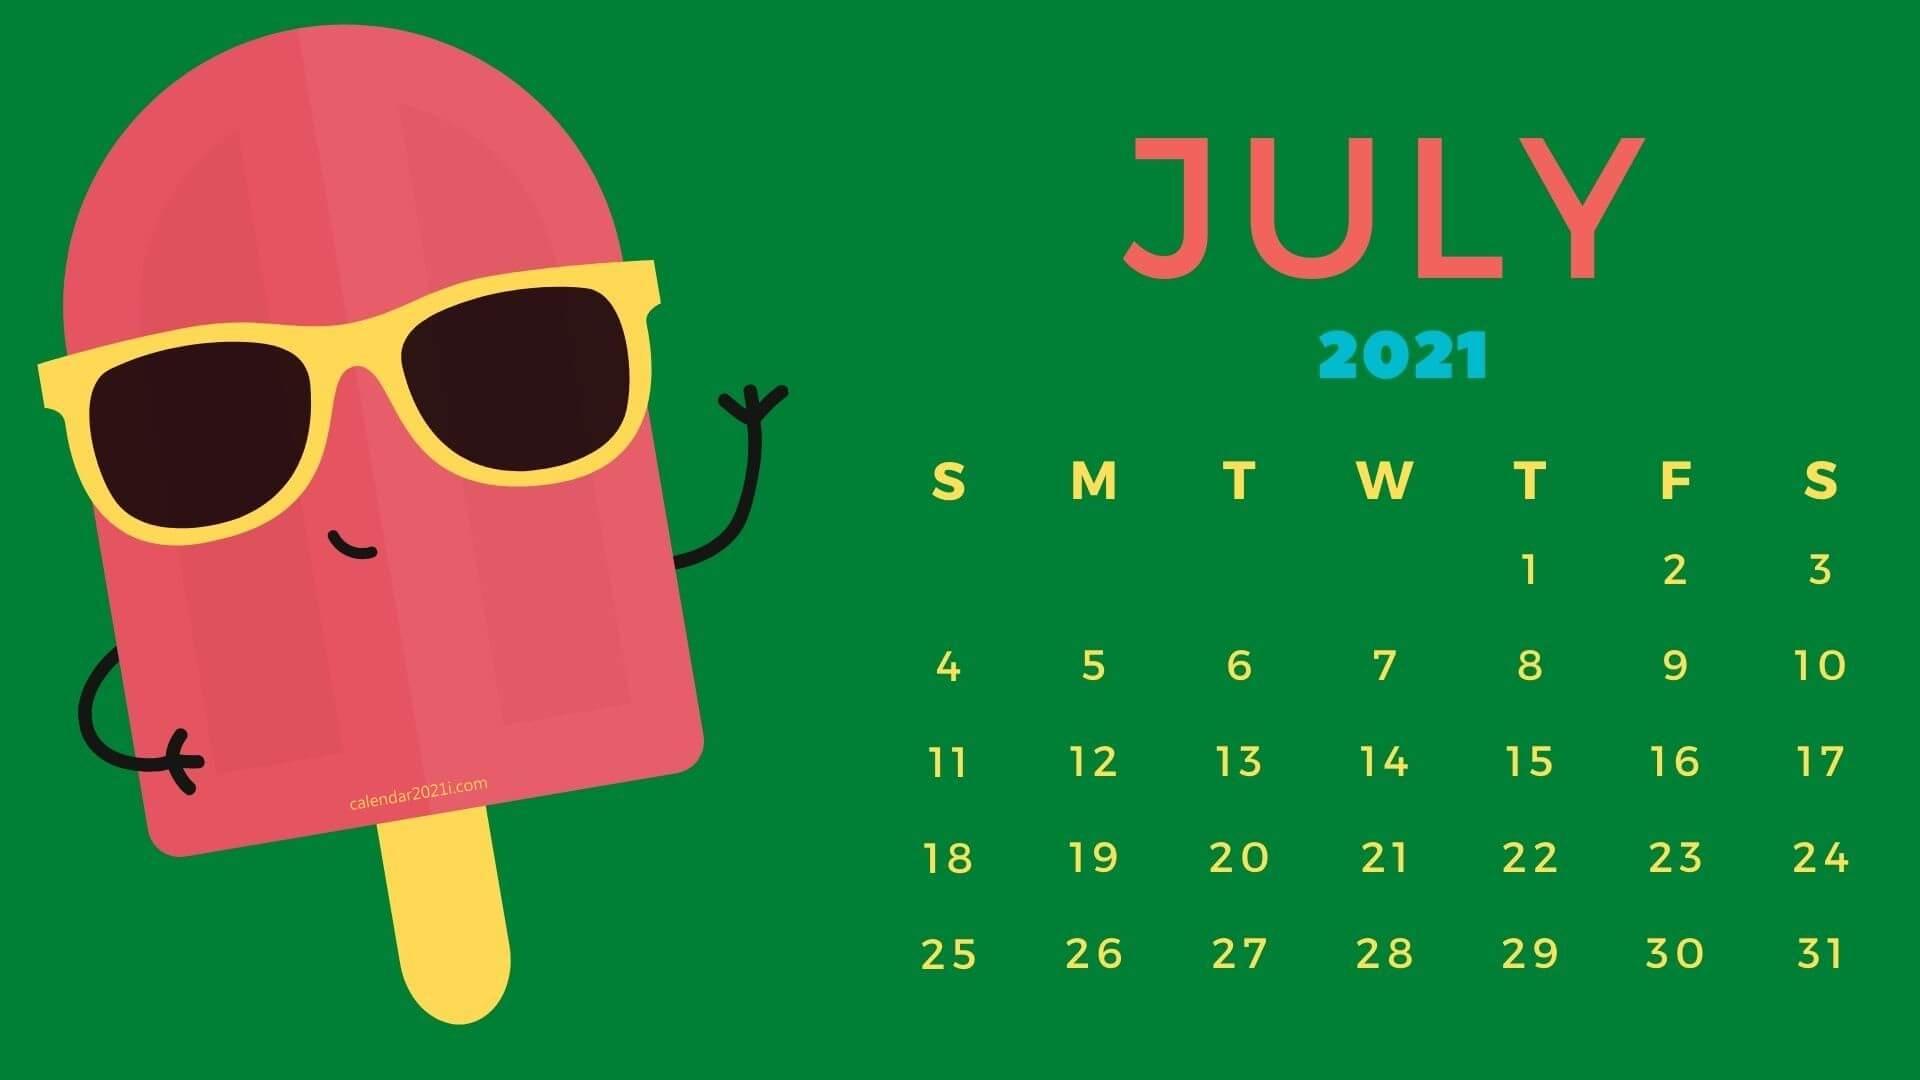 Free July 2021 Desktop Calendar Wallpaper Download